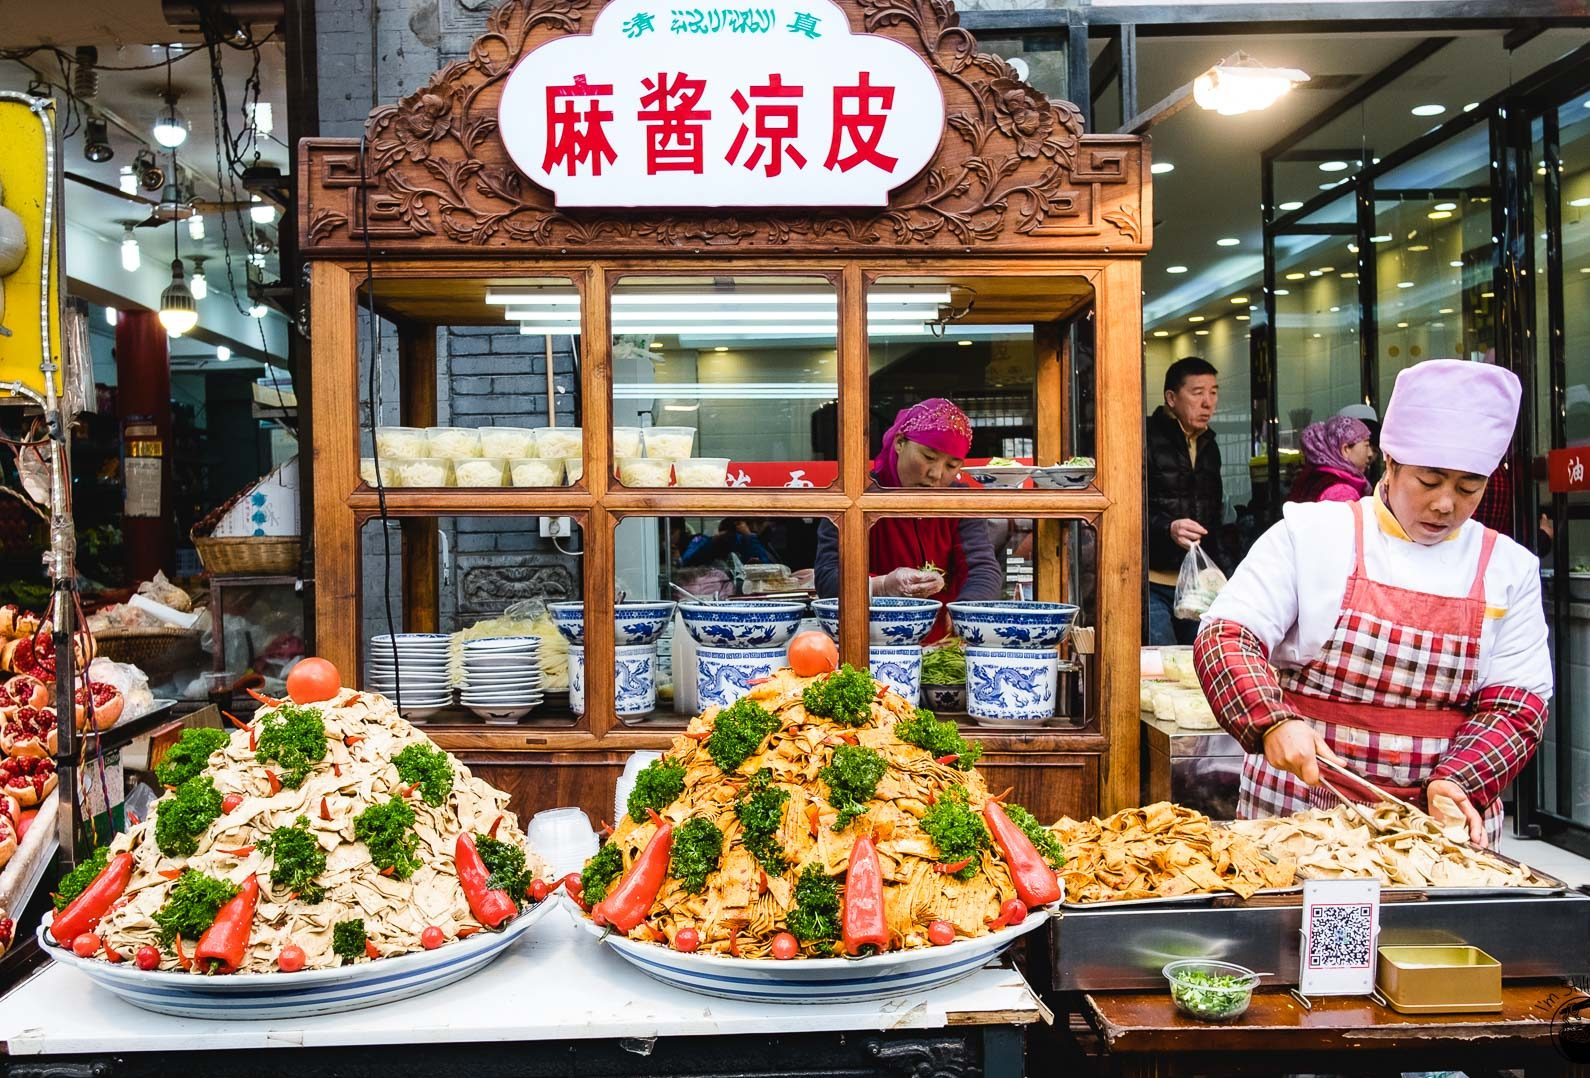 麻酱凉皮 (ma jiang liang pi) Hui Min Jie Xi'an Muslim Street Food